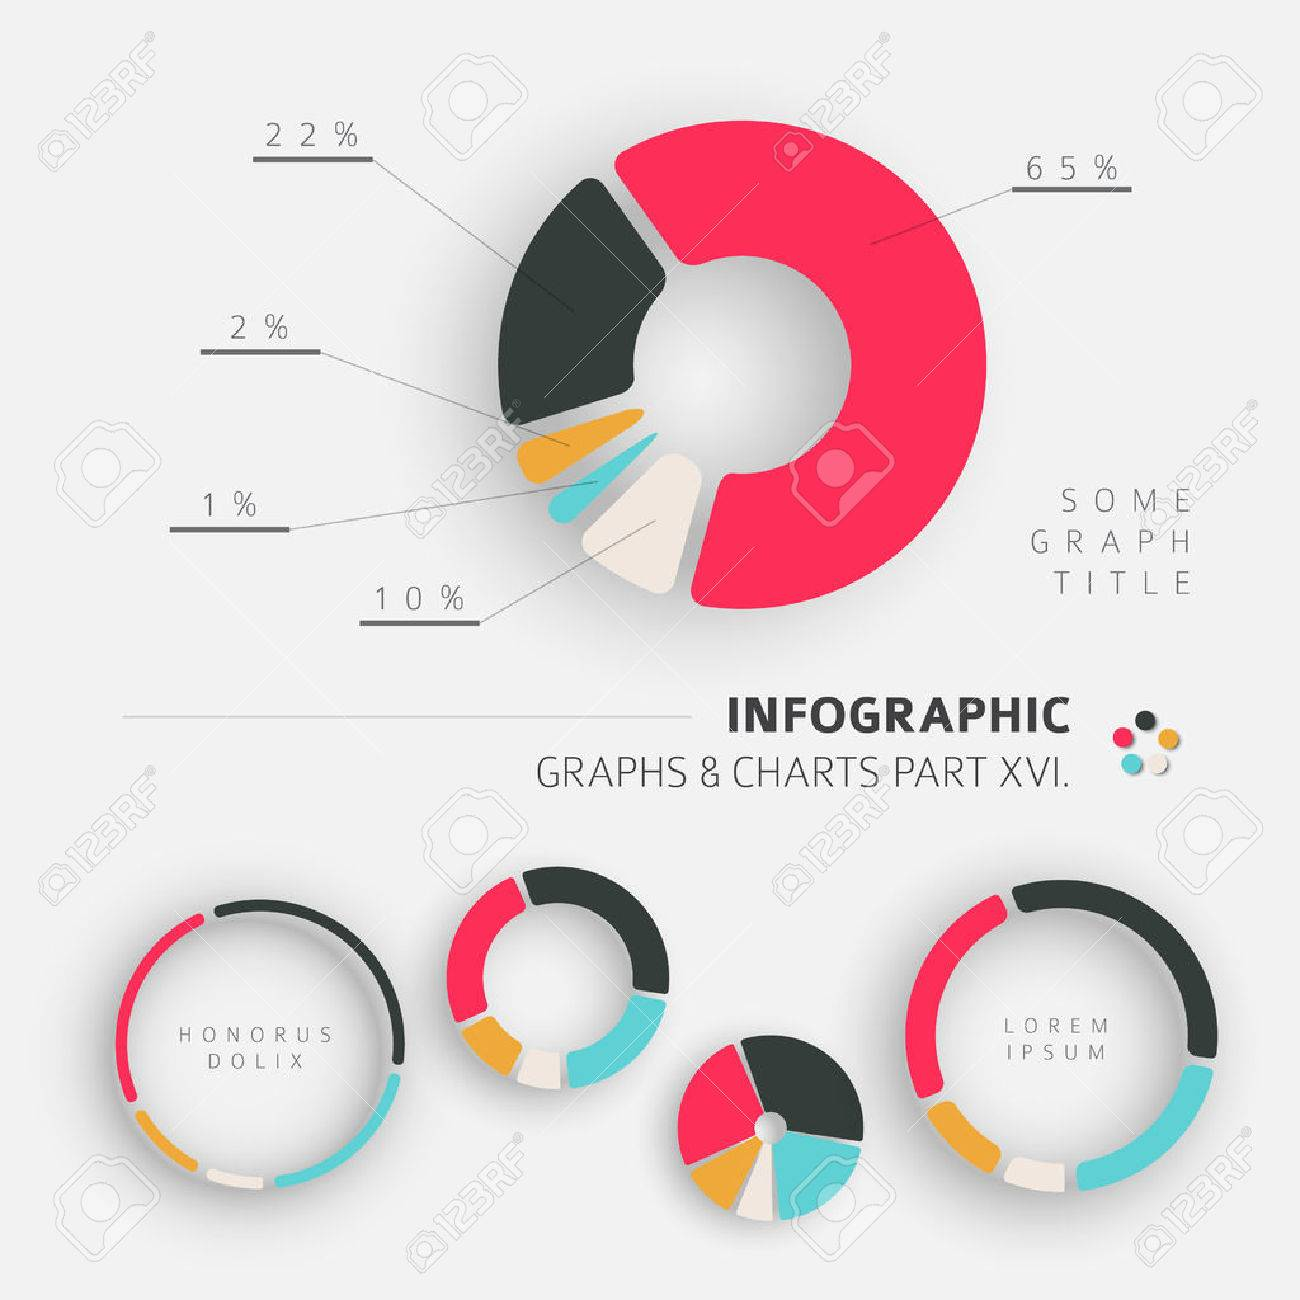 Vector flat design infographic elements - pie charts - 16. part of my infographic bundle - 48151428